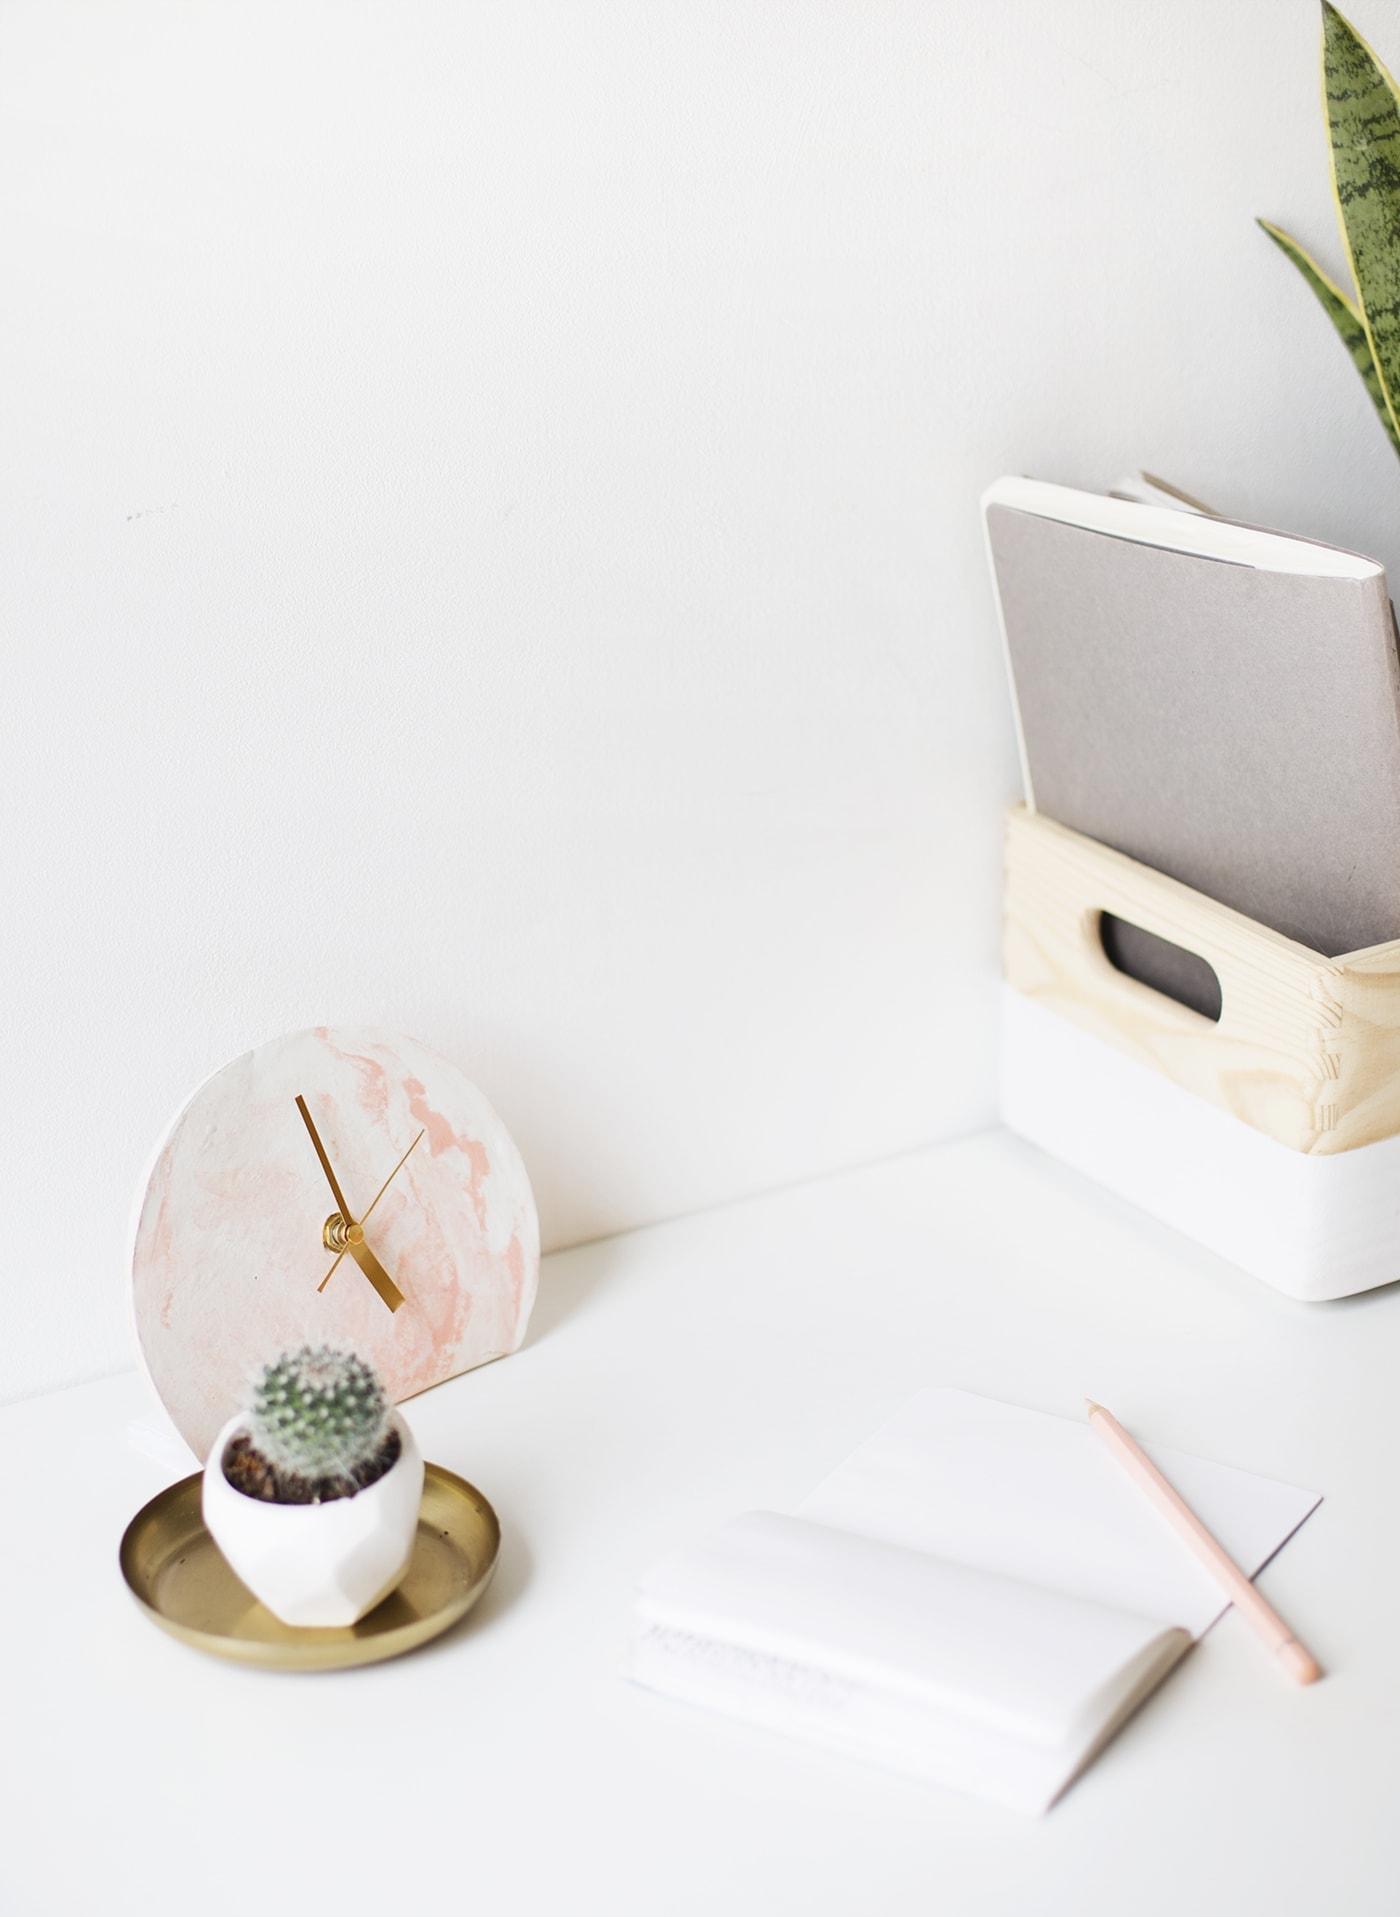 DIY mini standing desk clock tutorial | polymer clay